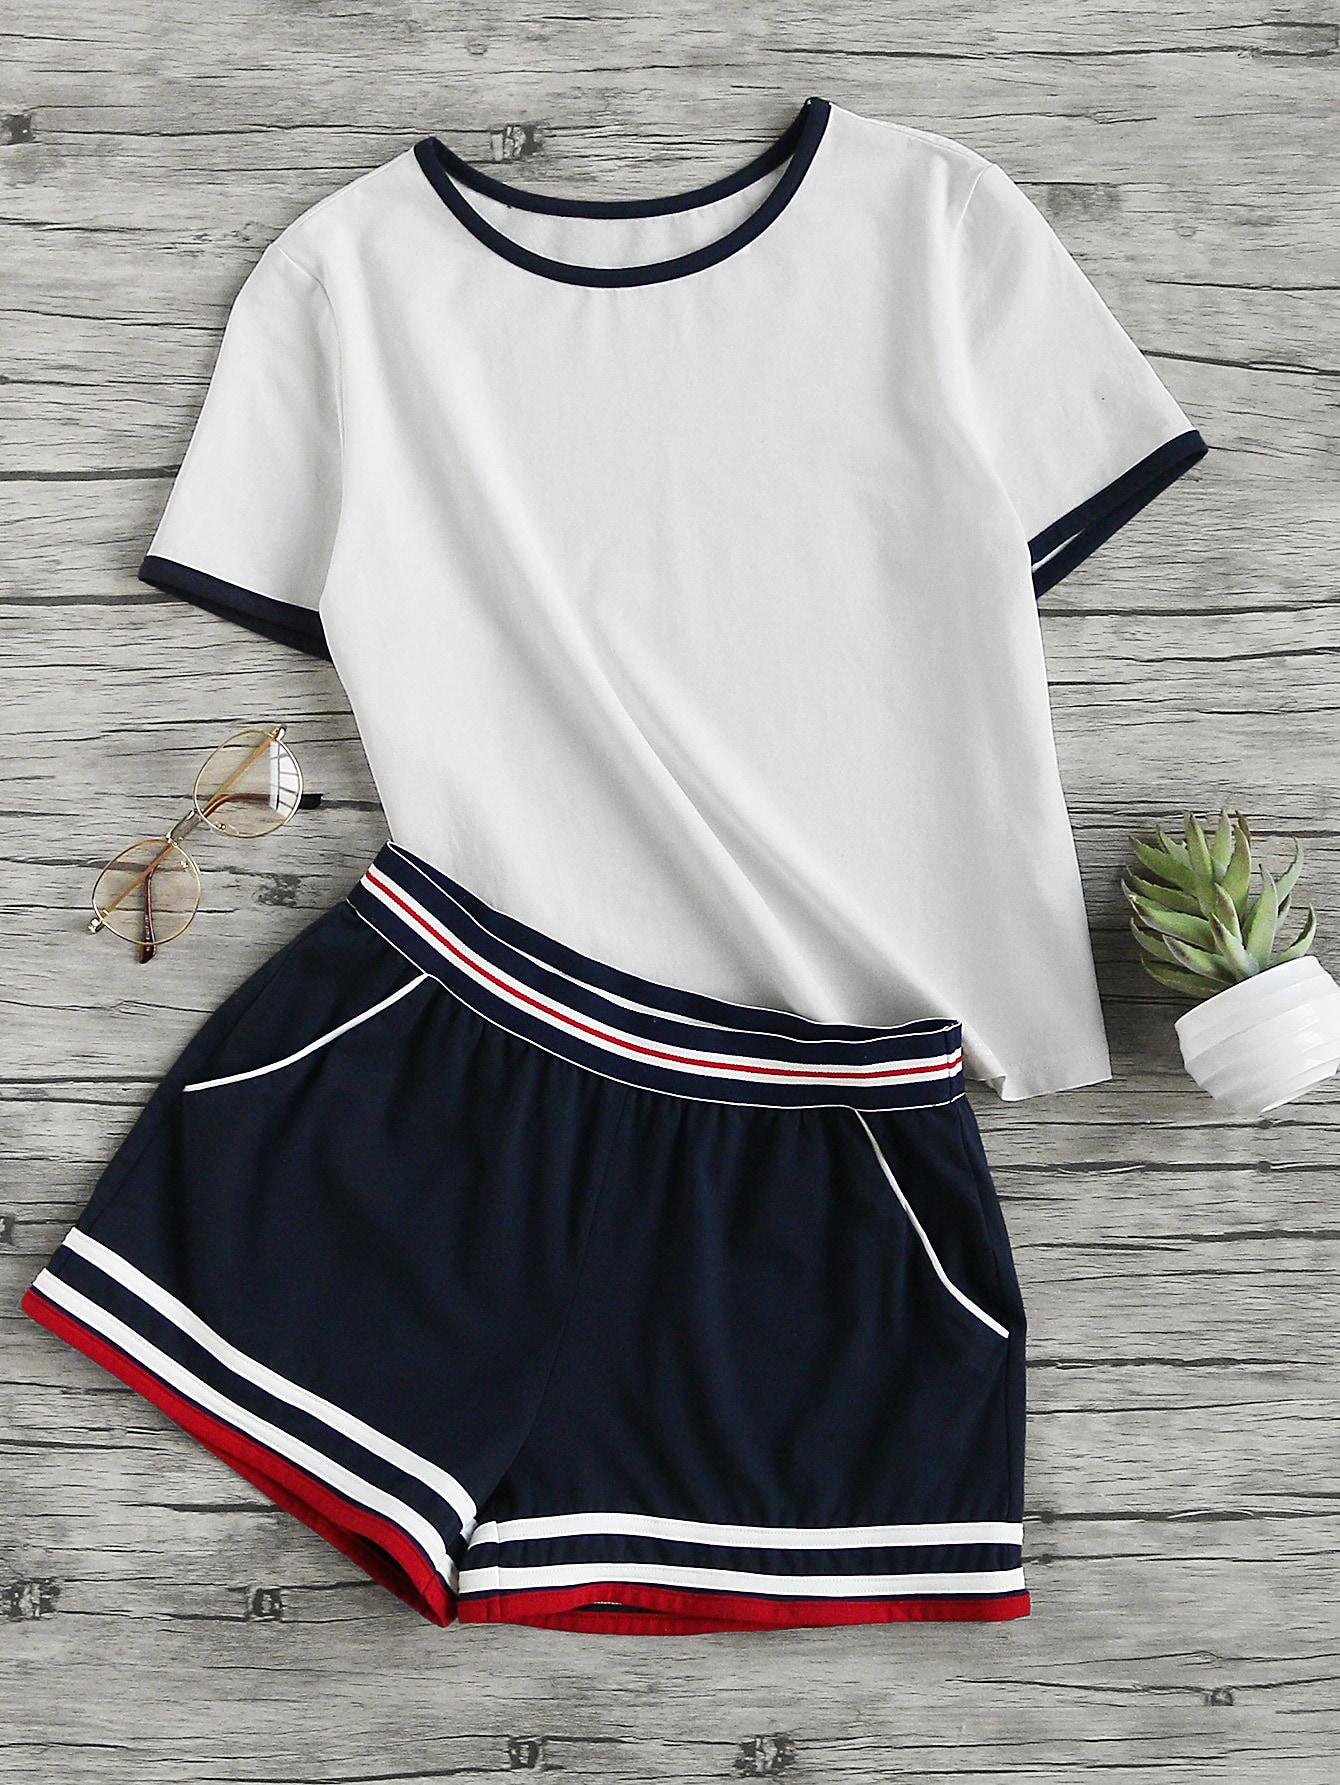 Ringer Tee And Striped Waist Binding Shorts SetFor Women-romwe